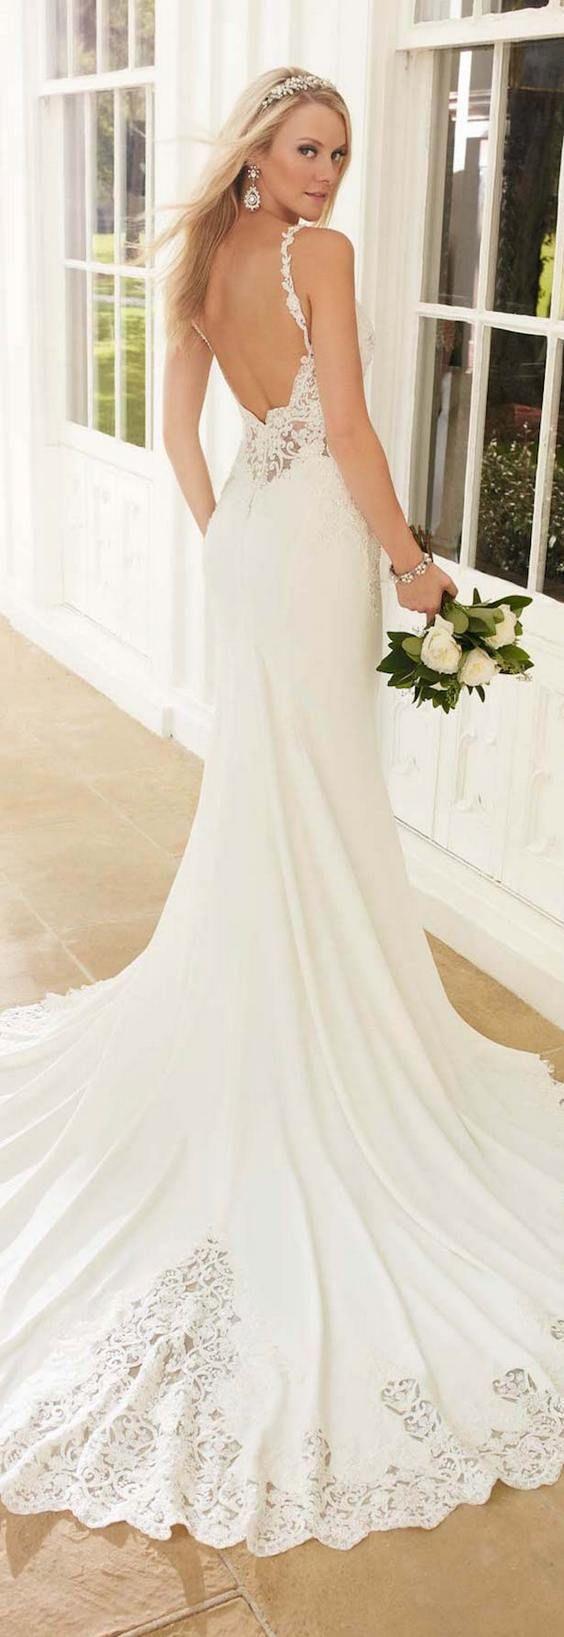 Open Back Wedding Dresses with Beautiful Details  Wedding dress